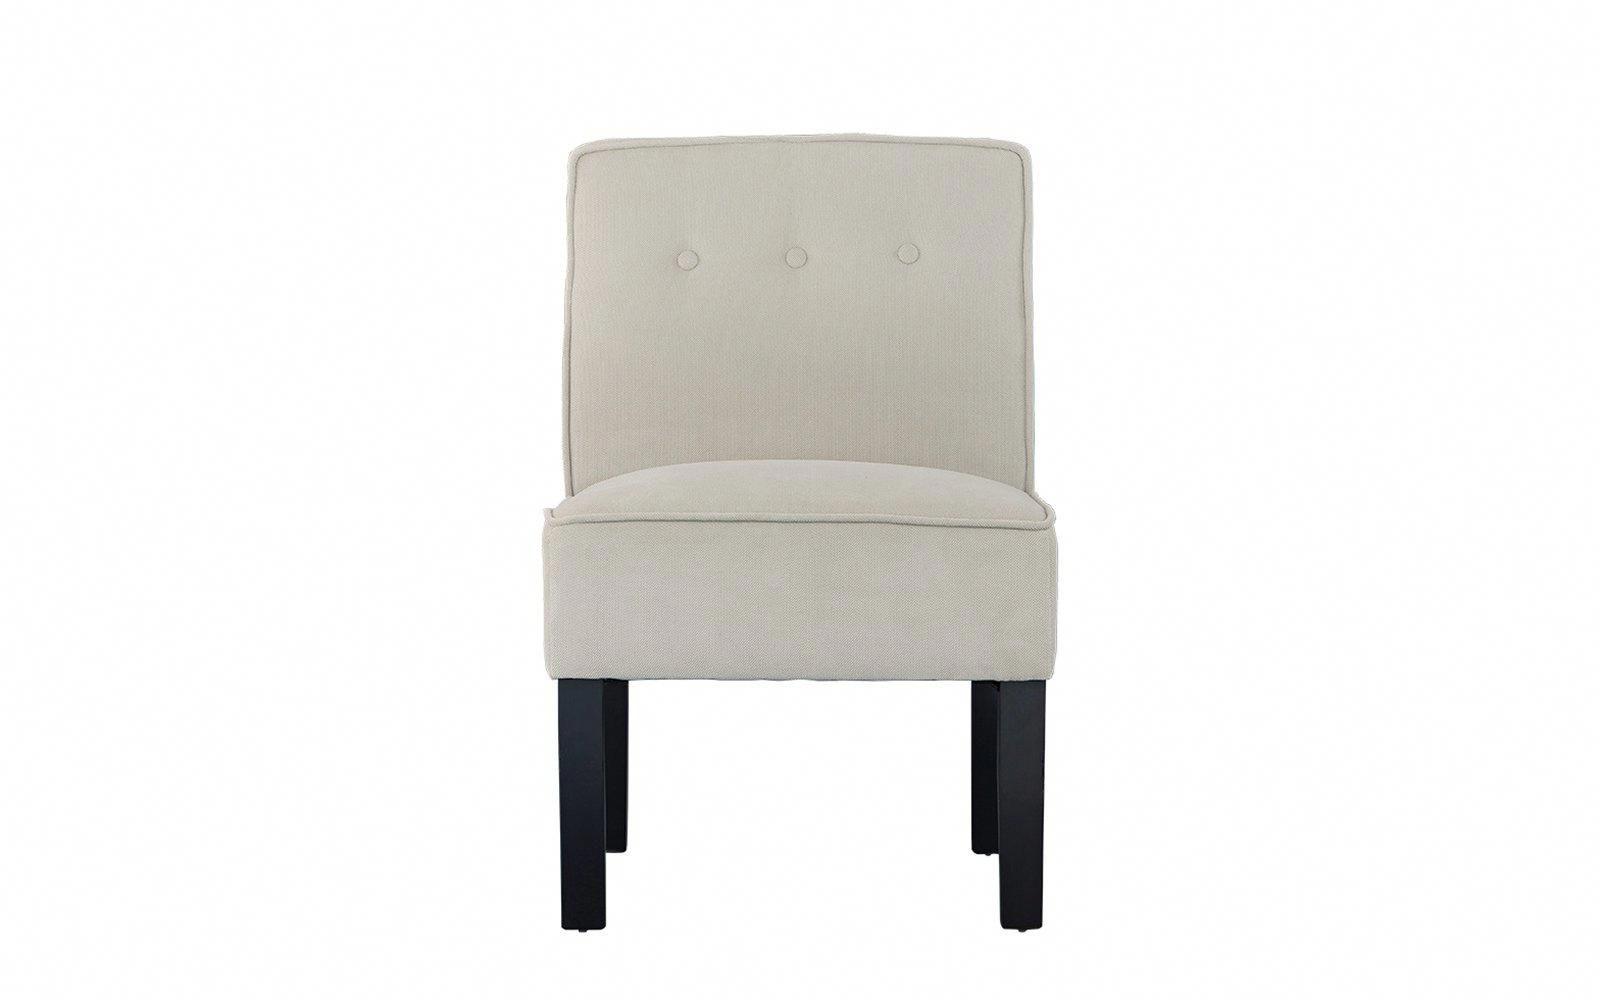 Ames Classic Armless Linen Accent Chair #ameschair (View 6 of 20)